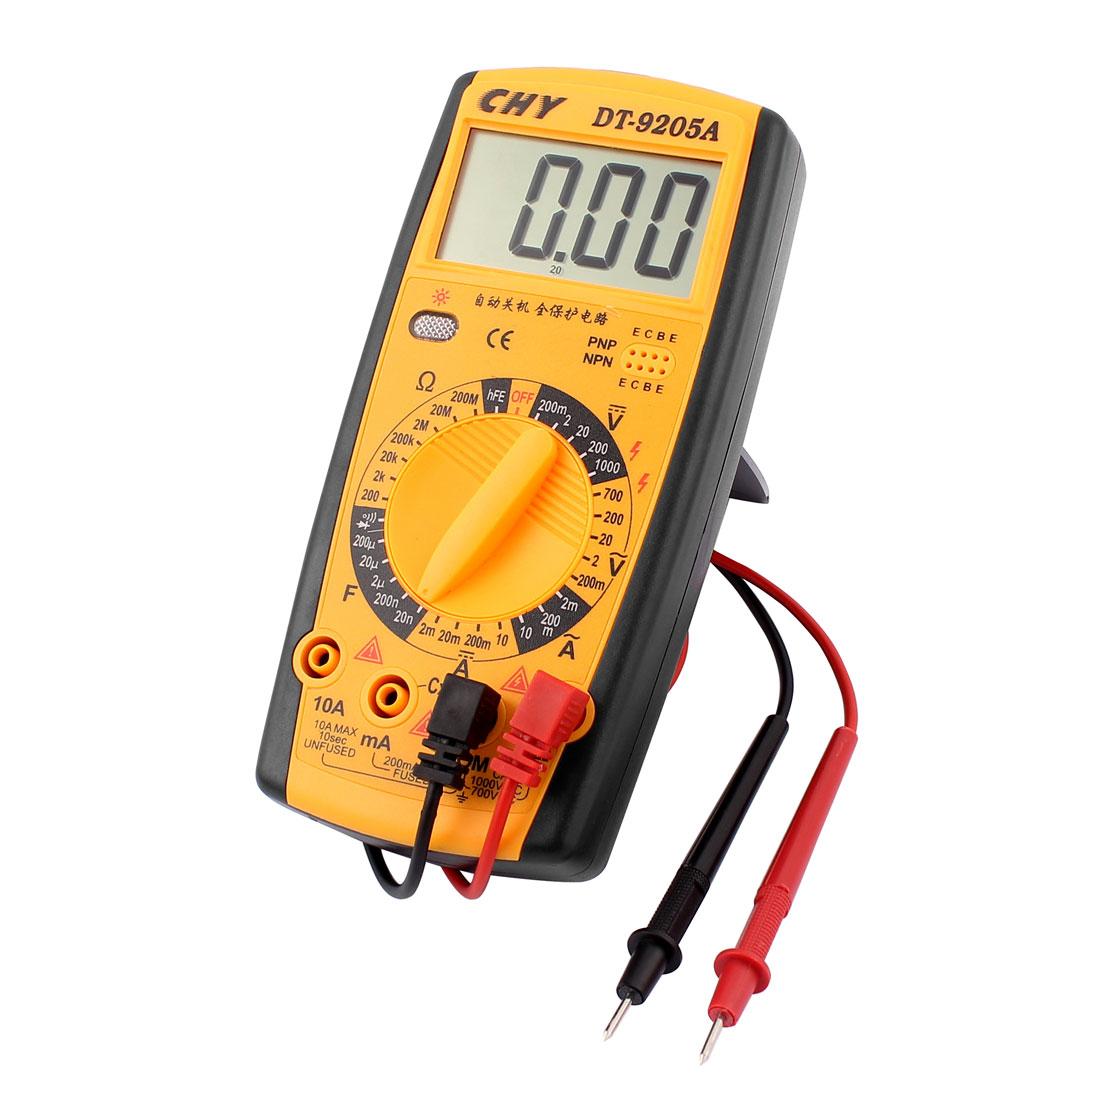 New DT9205A Digital Multimeter LCD AC/DC Ammeter Resistance Capacitance Tester